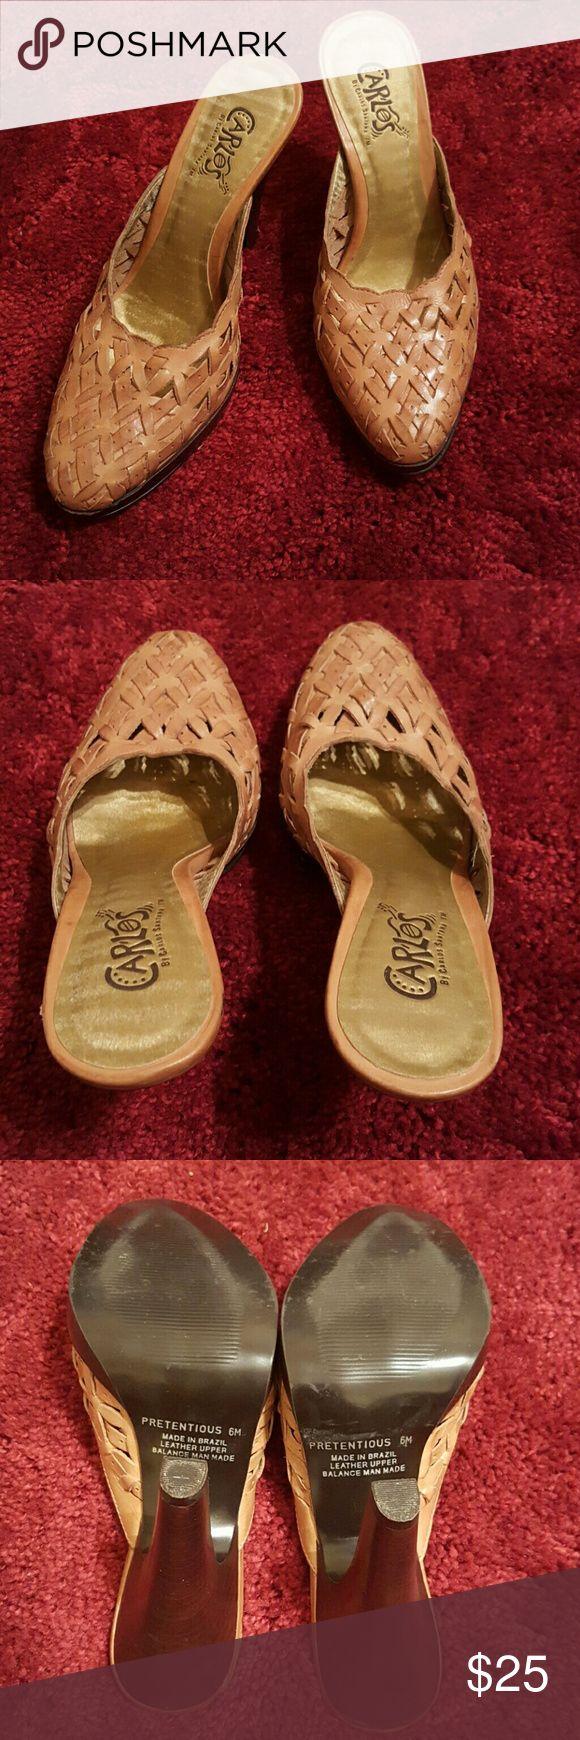 "Carlos Santana Tan Leather Mule | Size 6 Carlos Santana Tan Leather Mule   Size 6  Color Tan  4 1/2"" Heels  Pre-loved! Great condition! Carlos Santana Shoes Mules & Clogs"